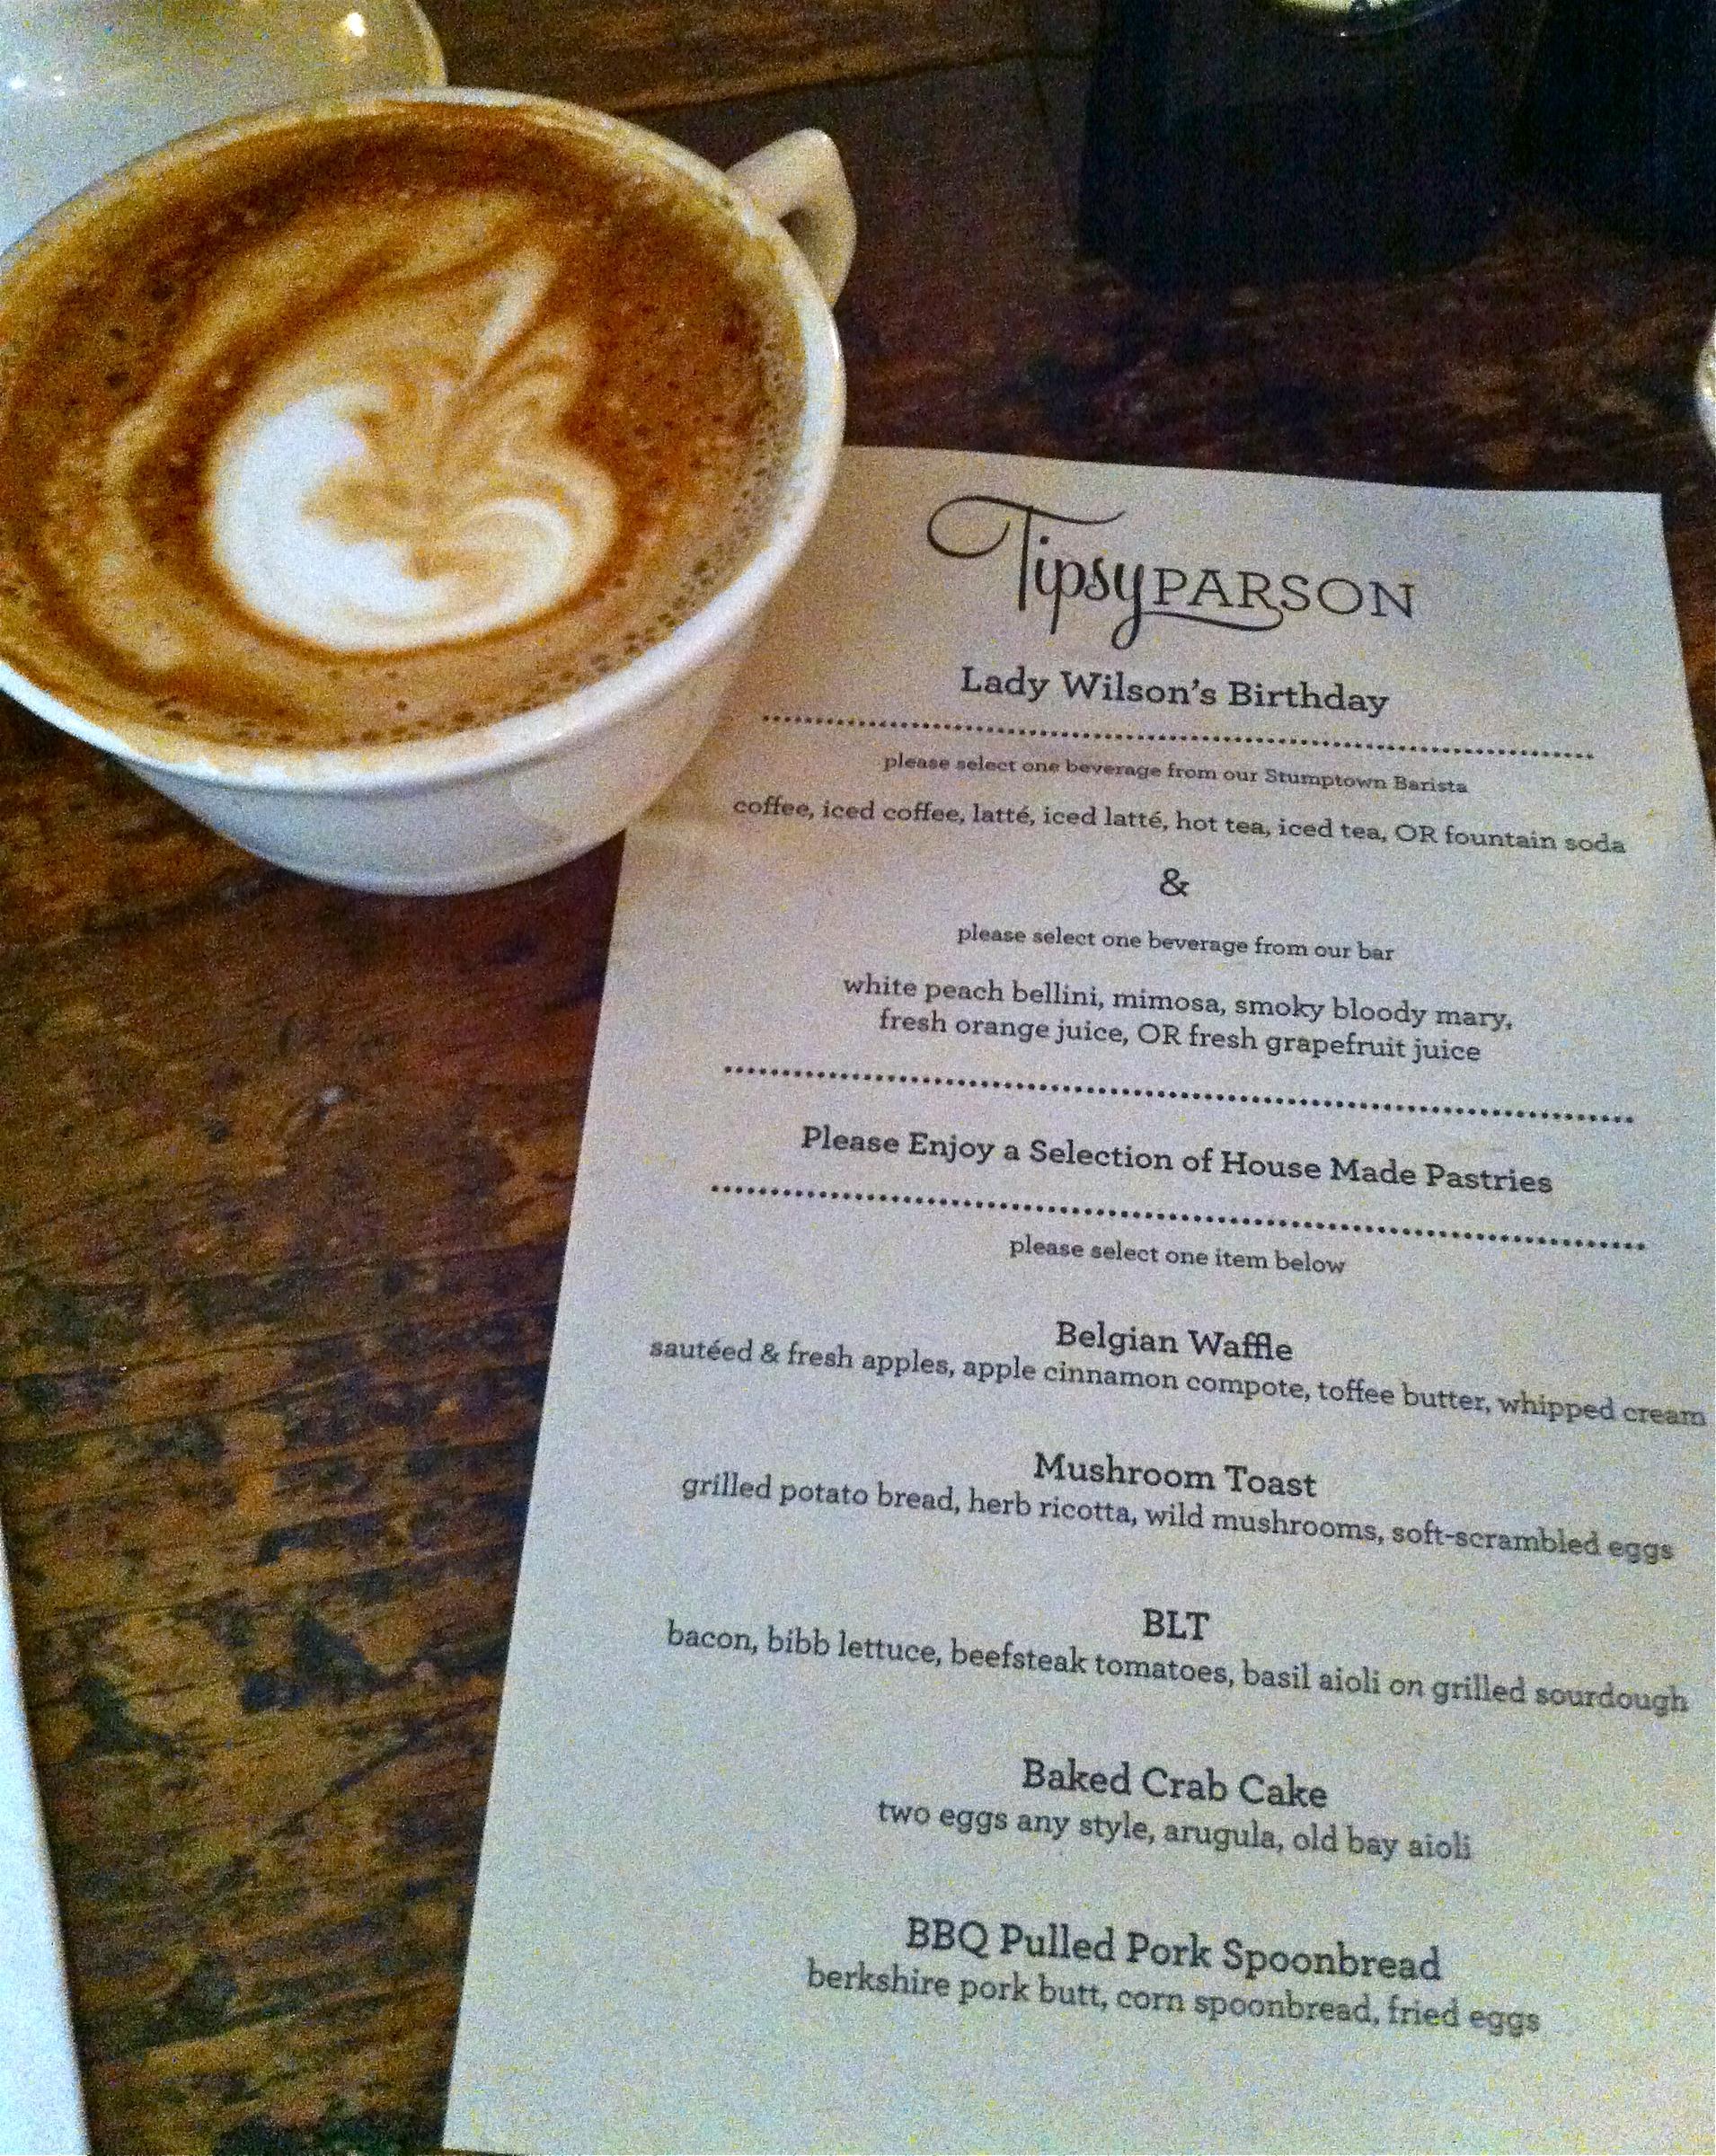 #TipsyParson #nyc #restaurants #brunch